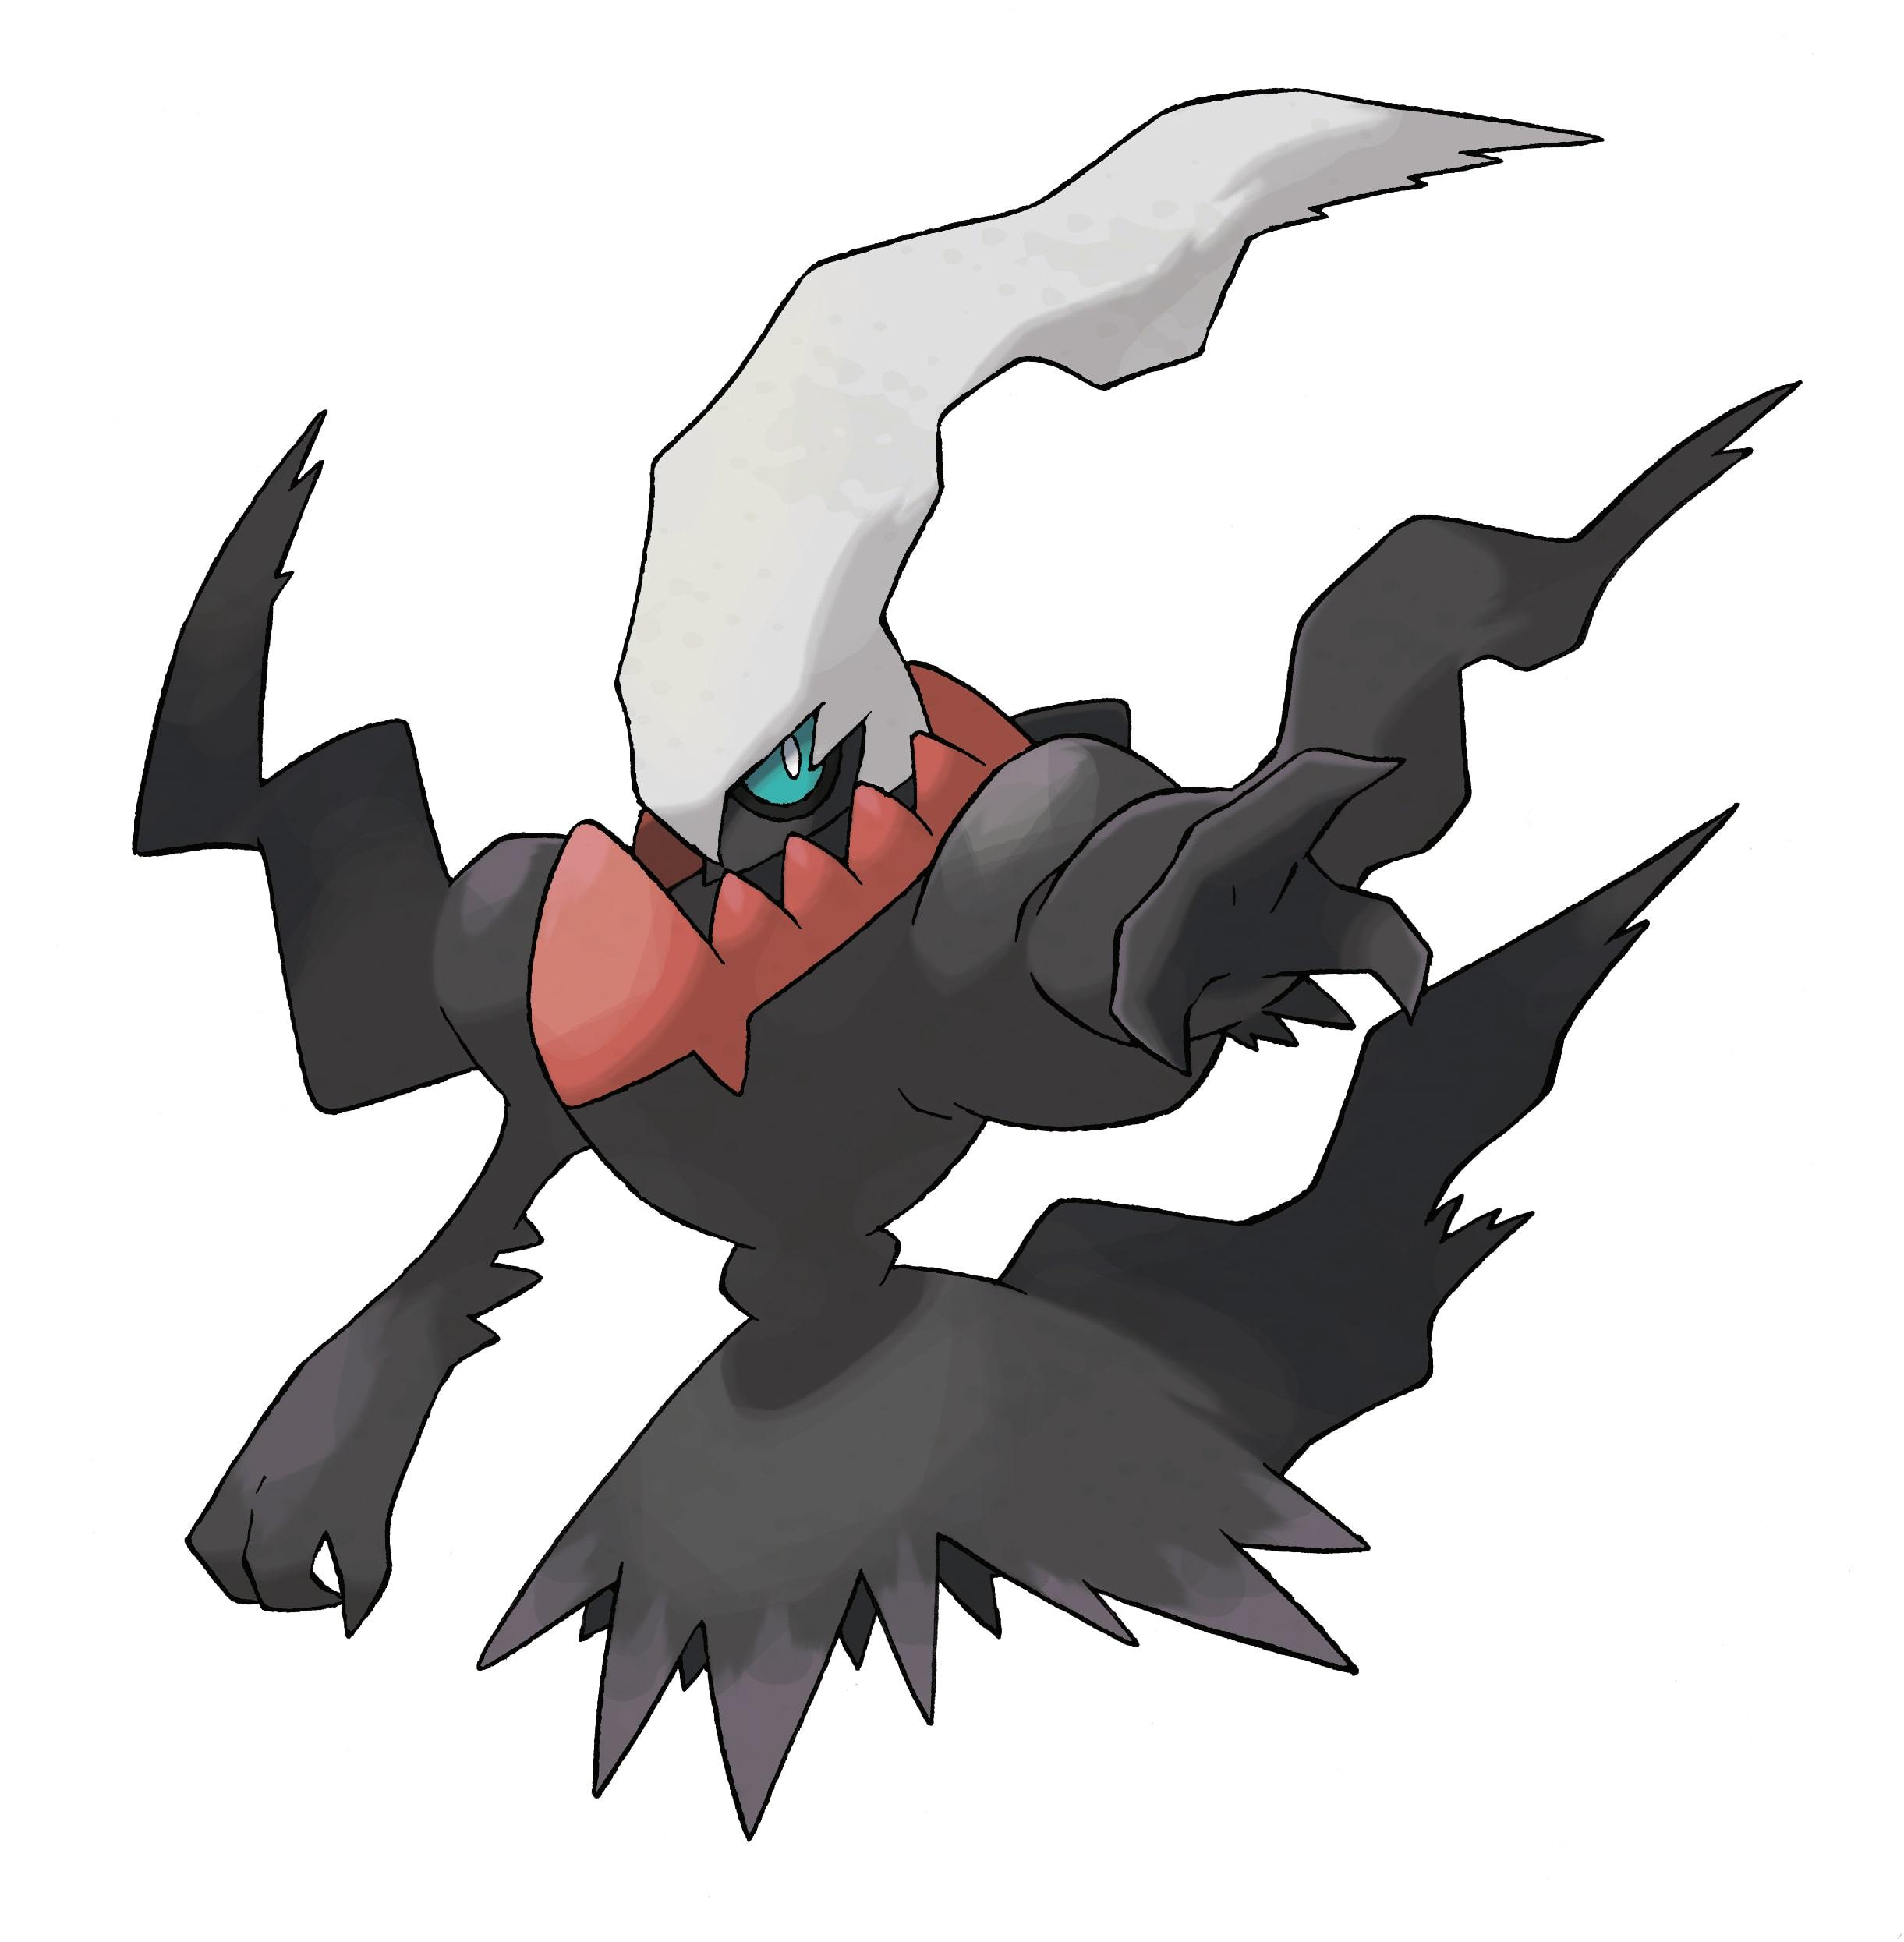 Exlusive Darkrai Pokemon giveaway in GAME Stores